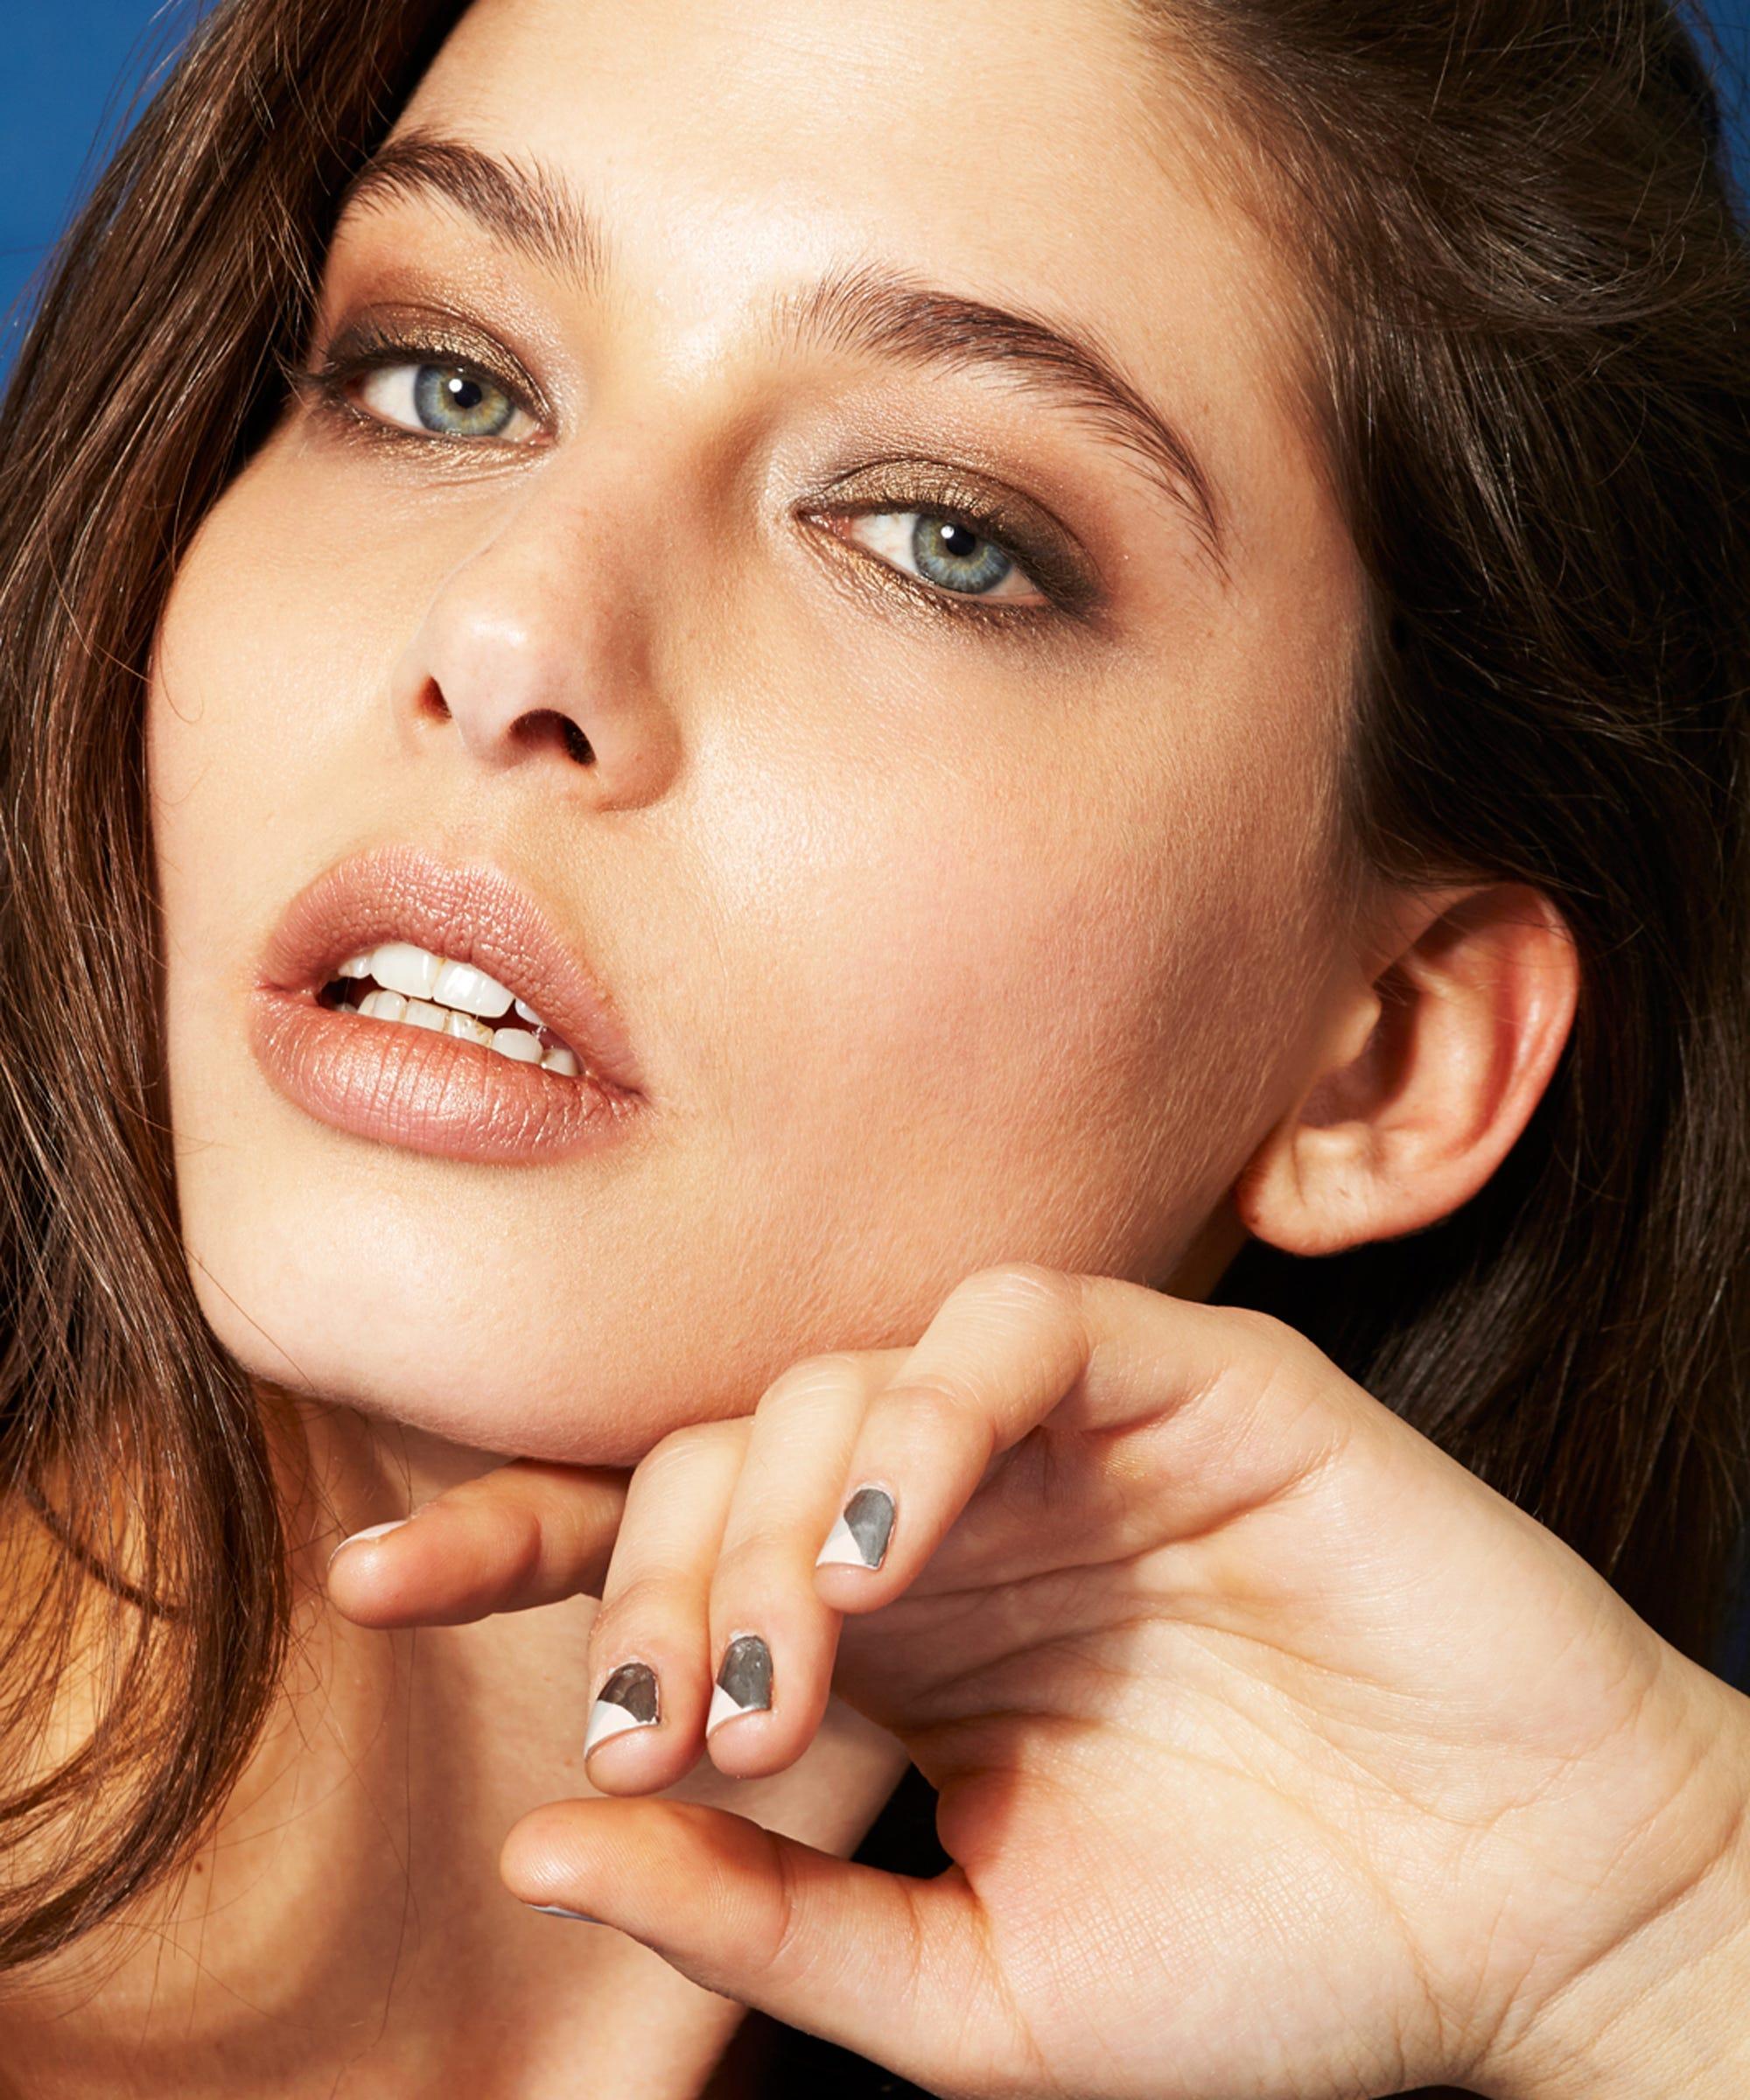 skin-makeup-op